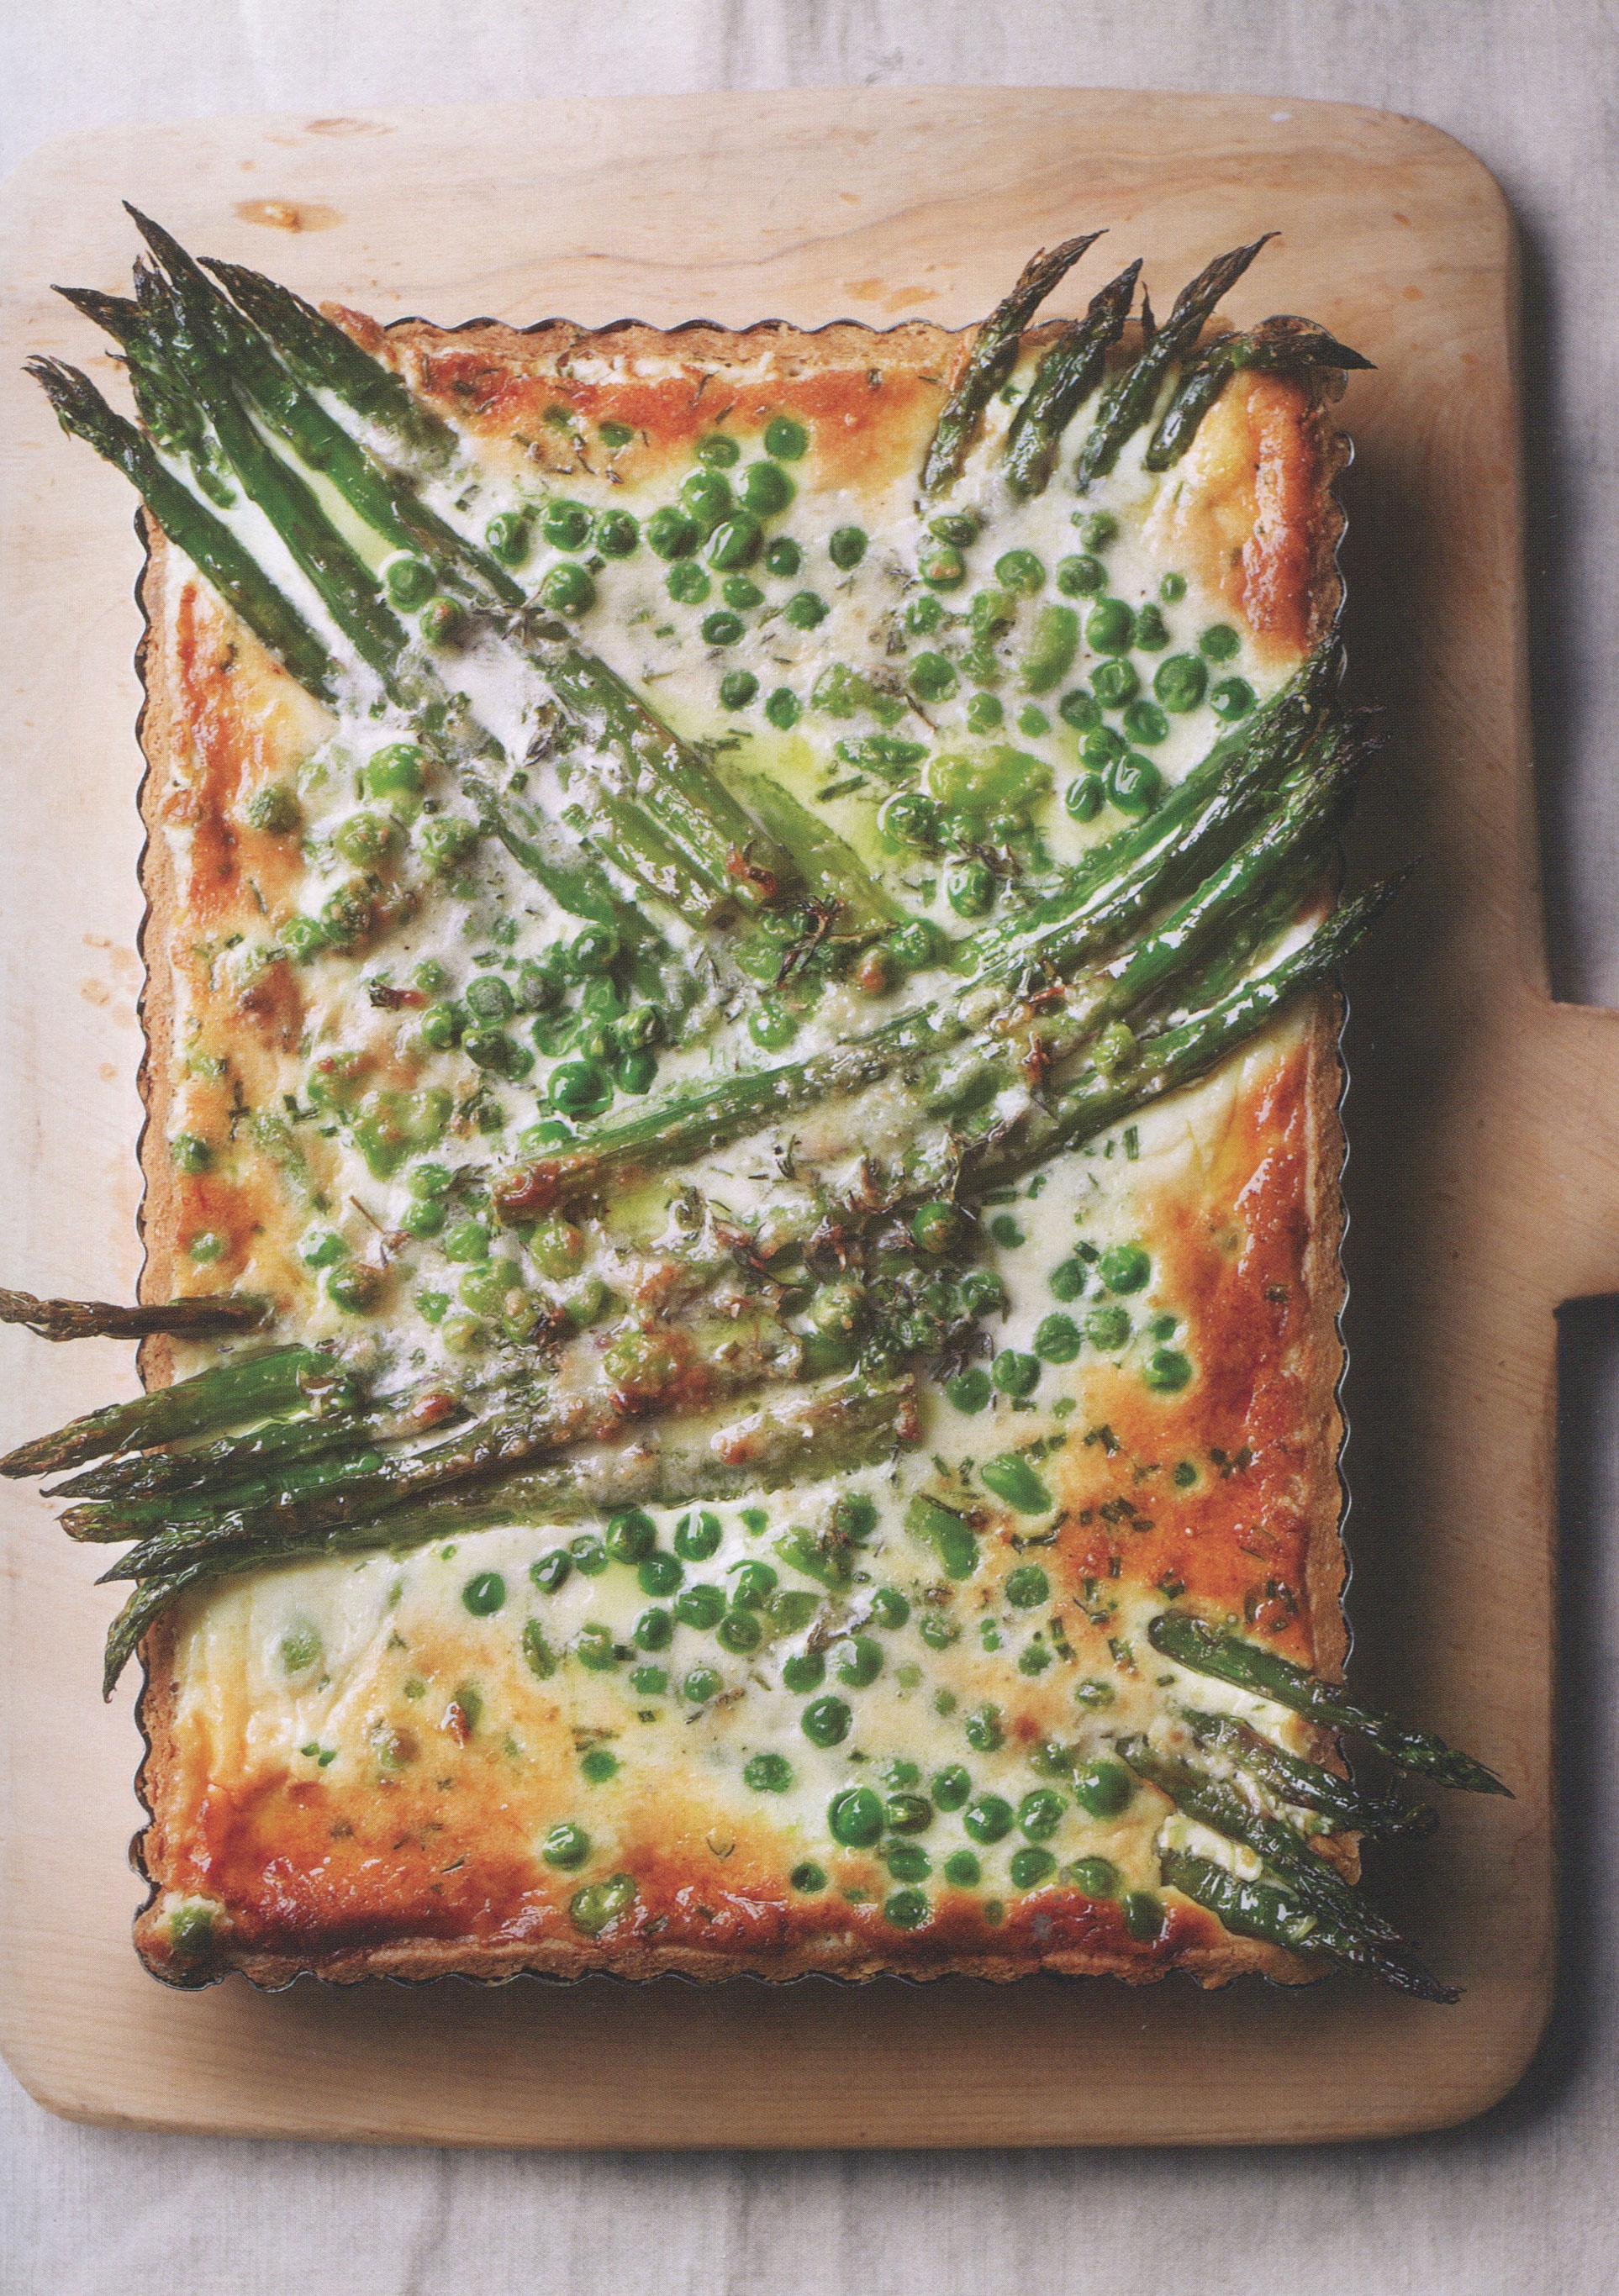 TBT Recipe: Spring Garden Green Tart